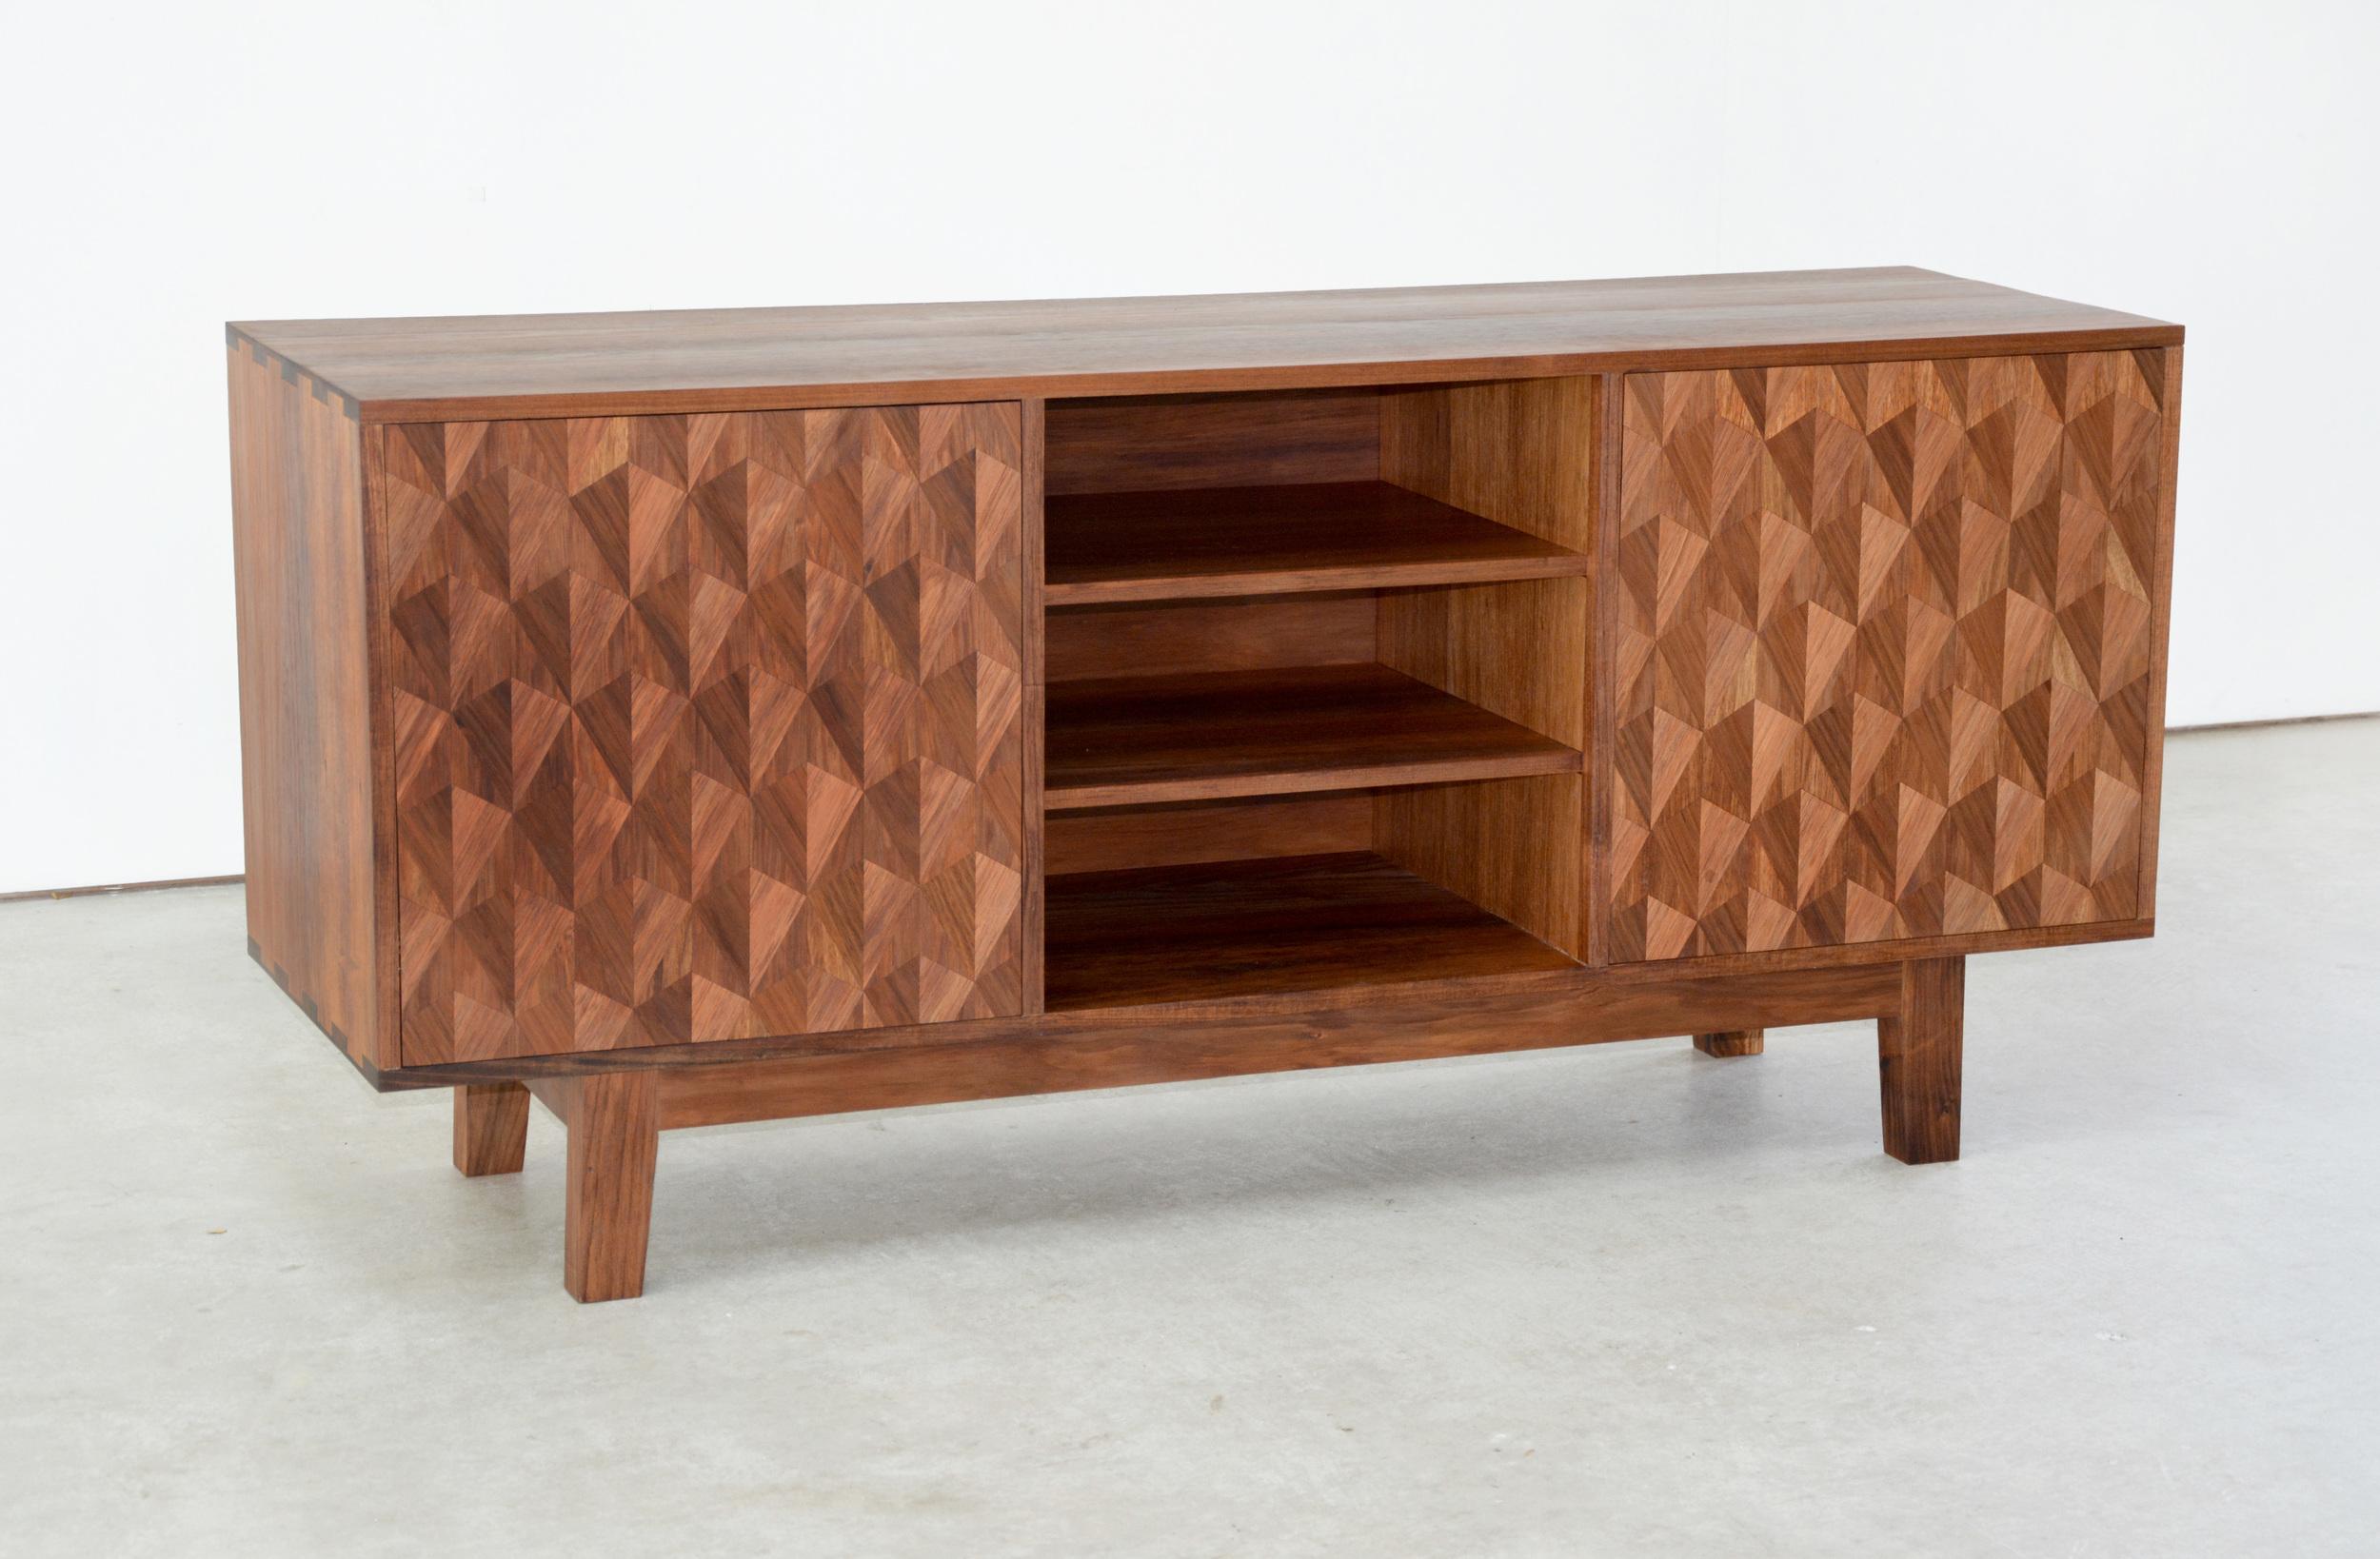 Chelsea lemon furniture design canberra australia Blackwood Sideboard